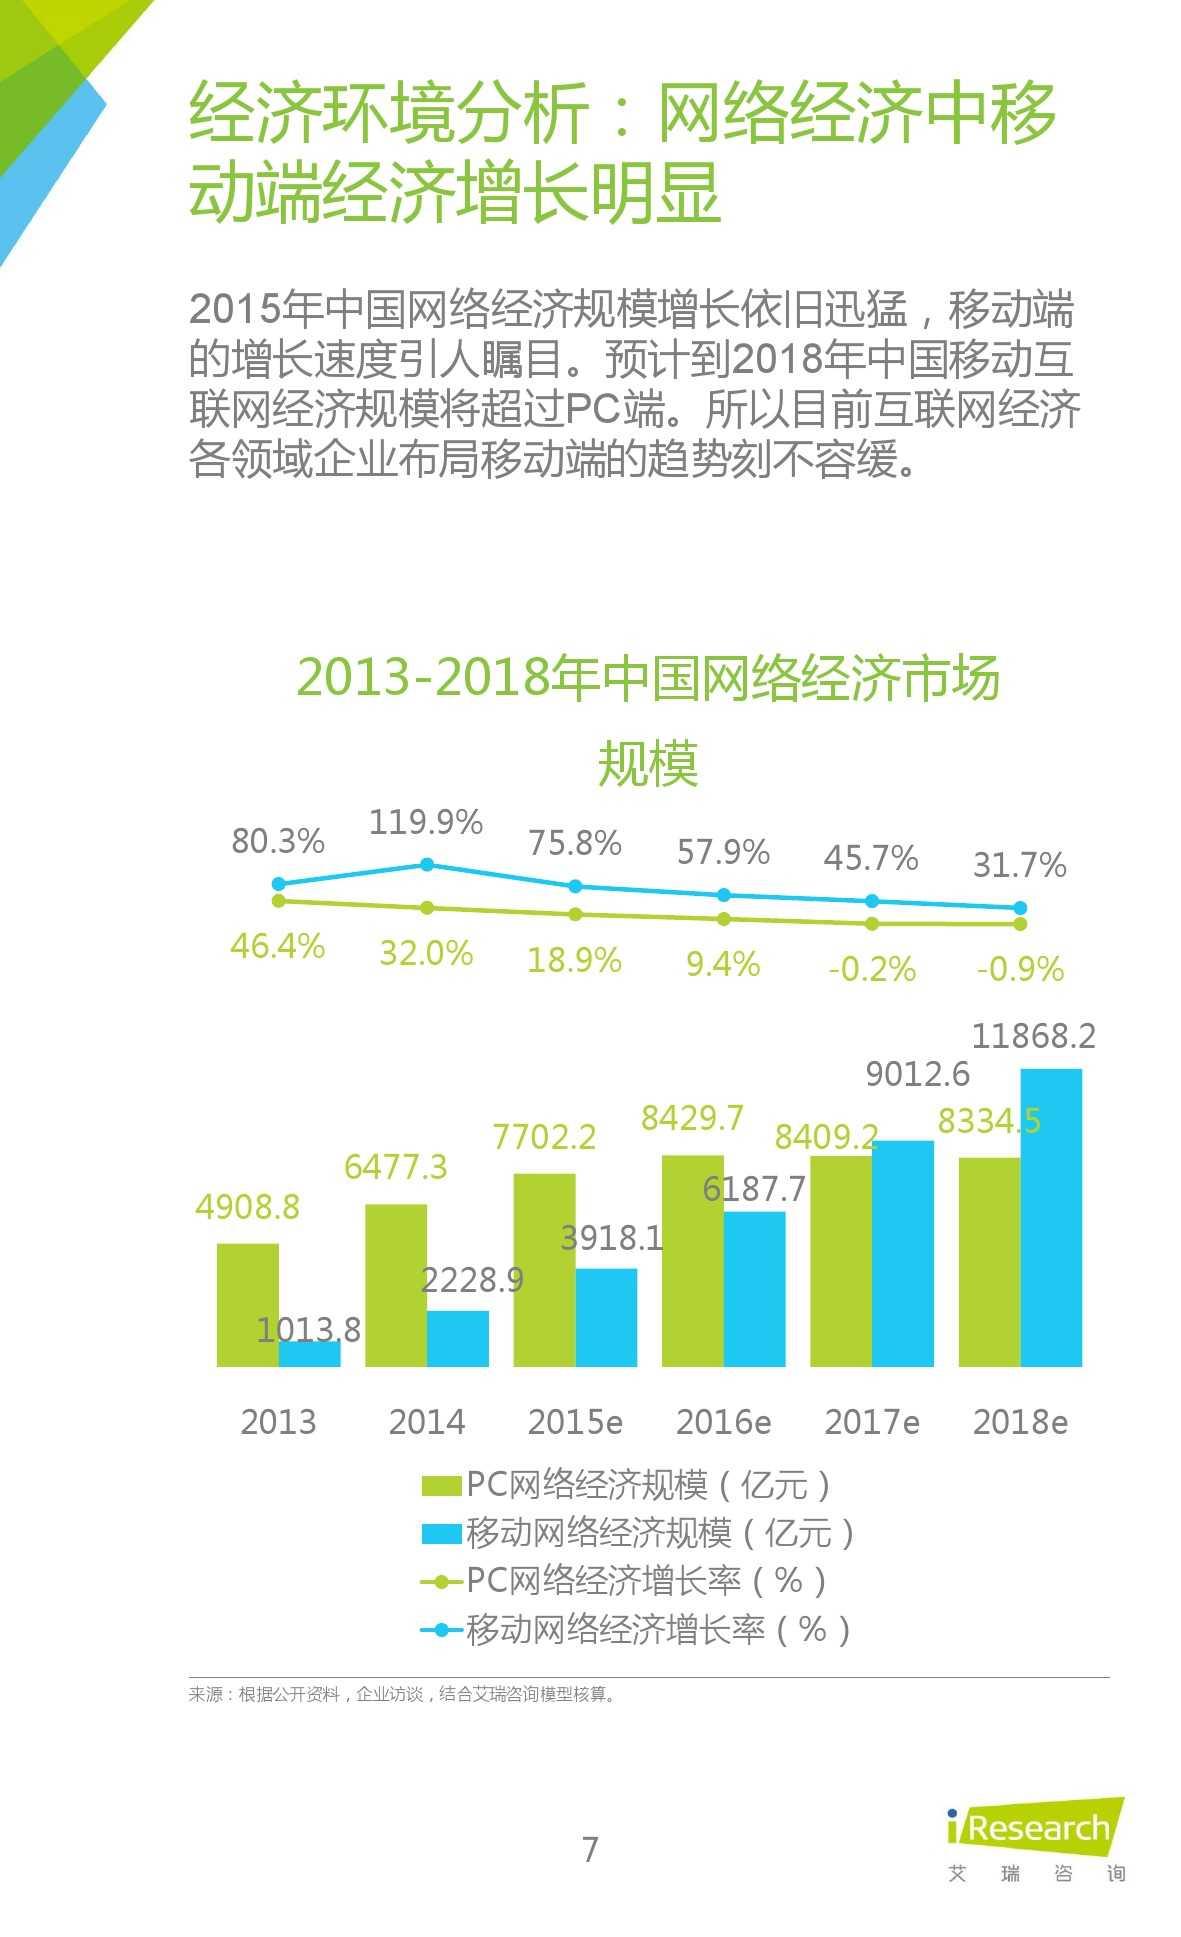 iResearch-2015年中国在线教育平台研究报告_000007